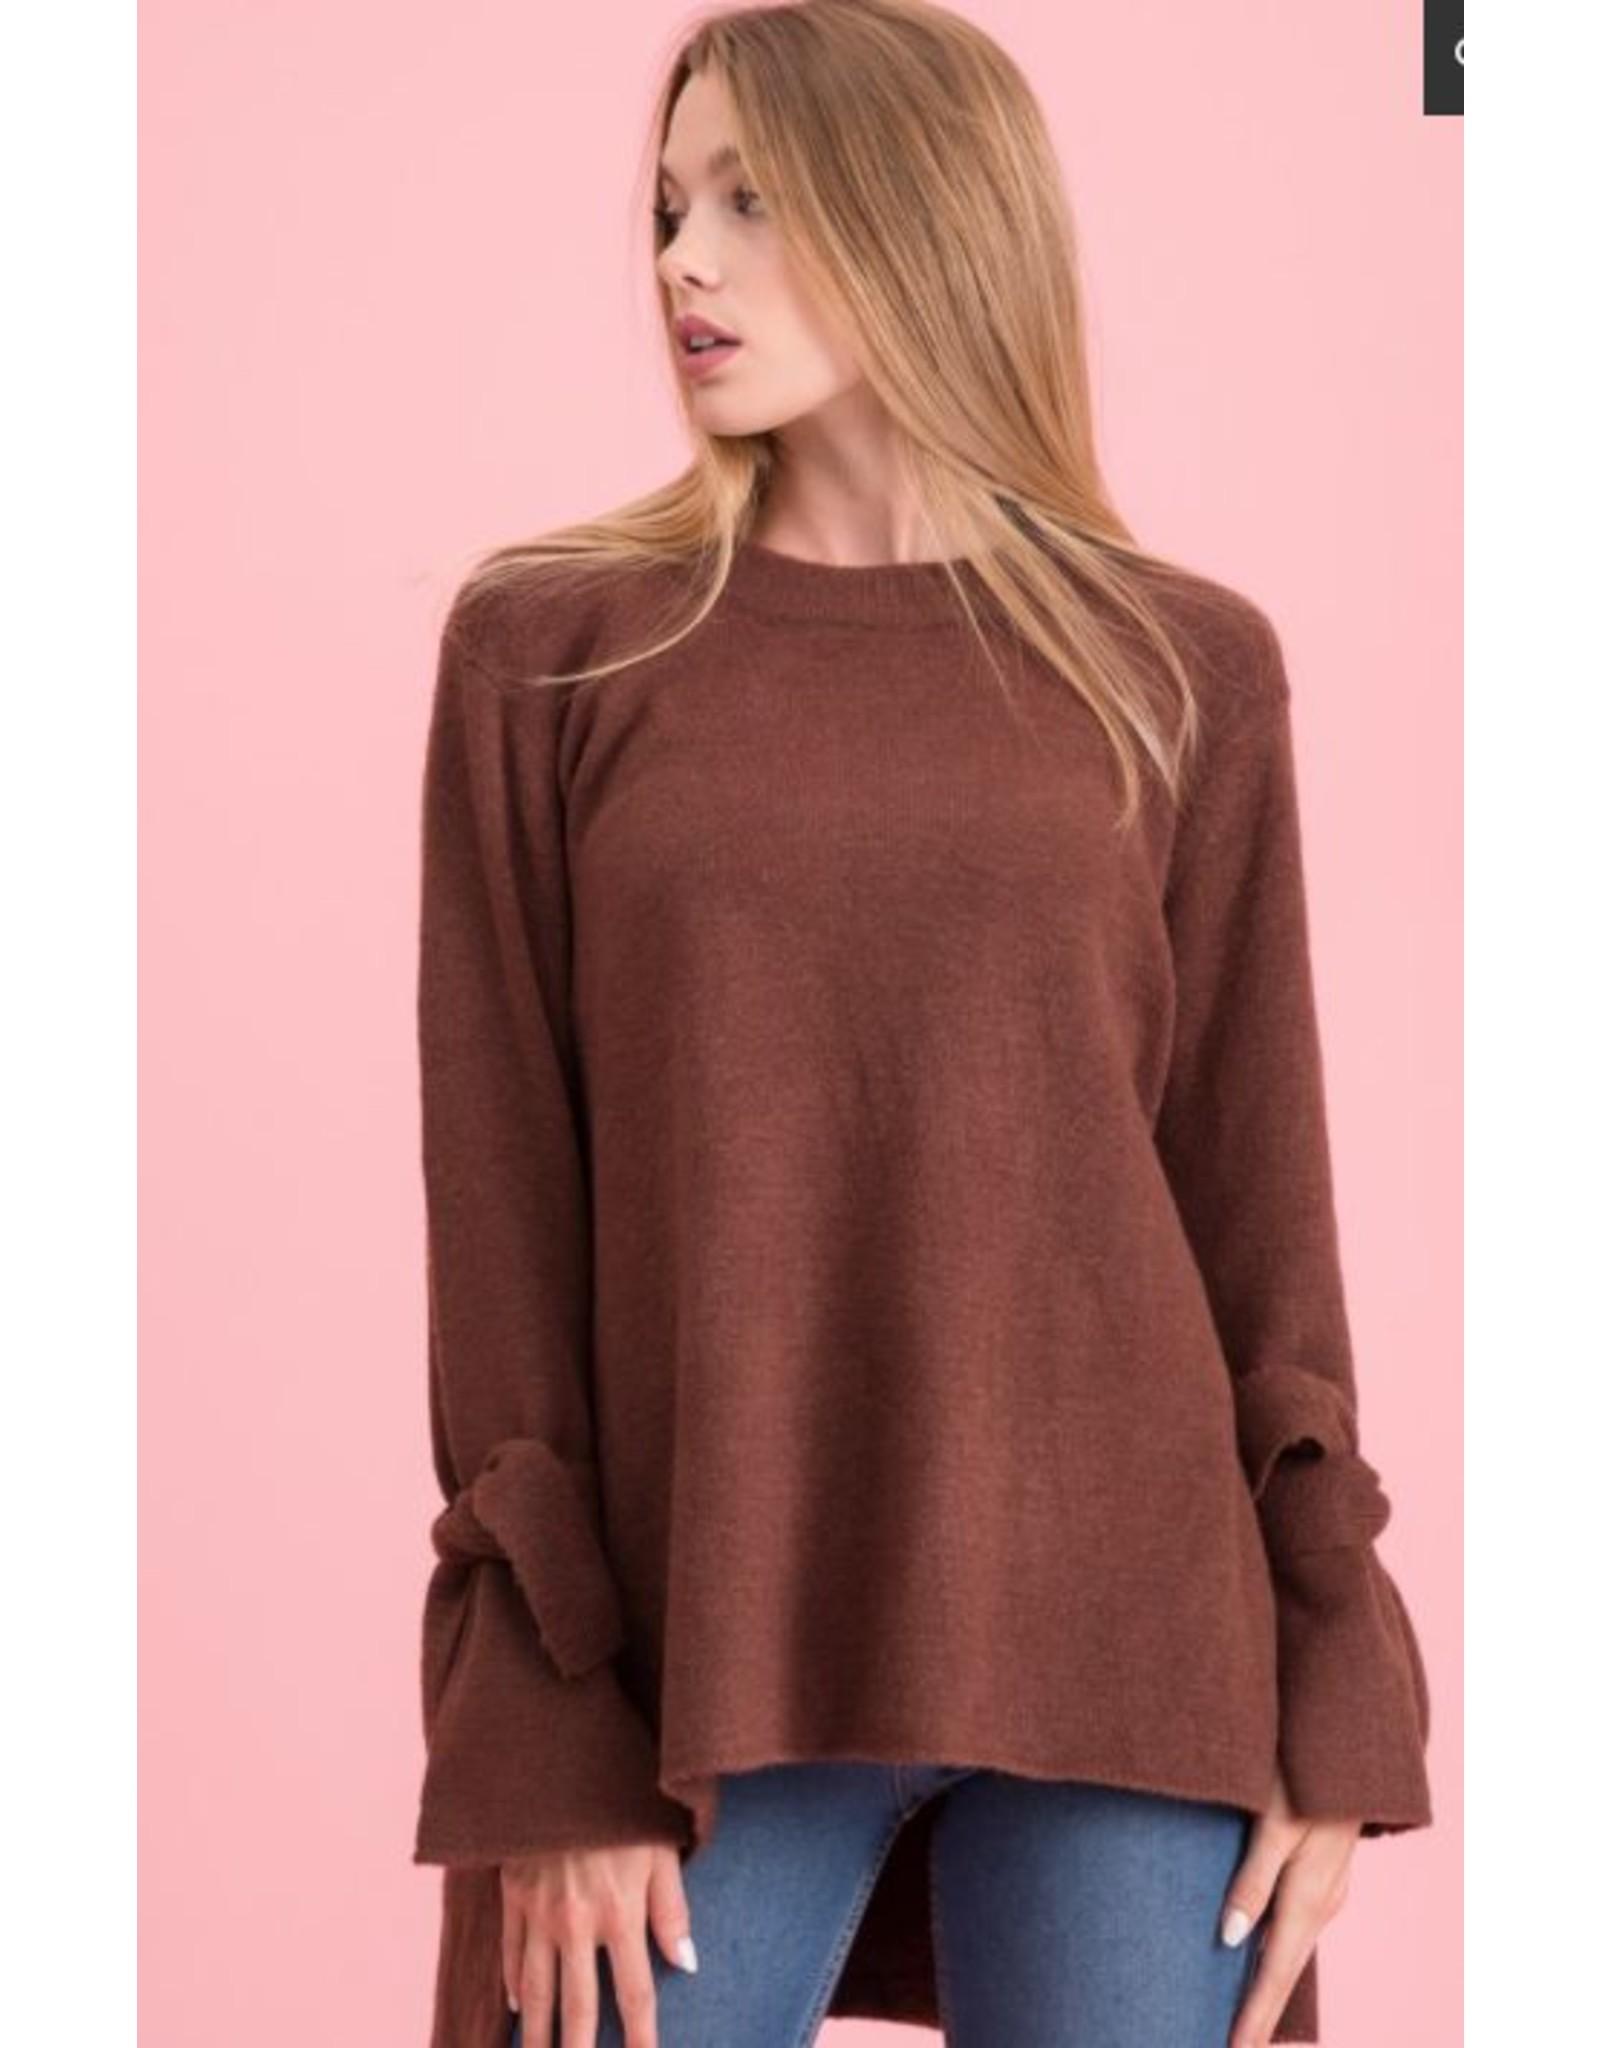 Rachel Sweater